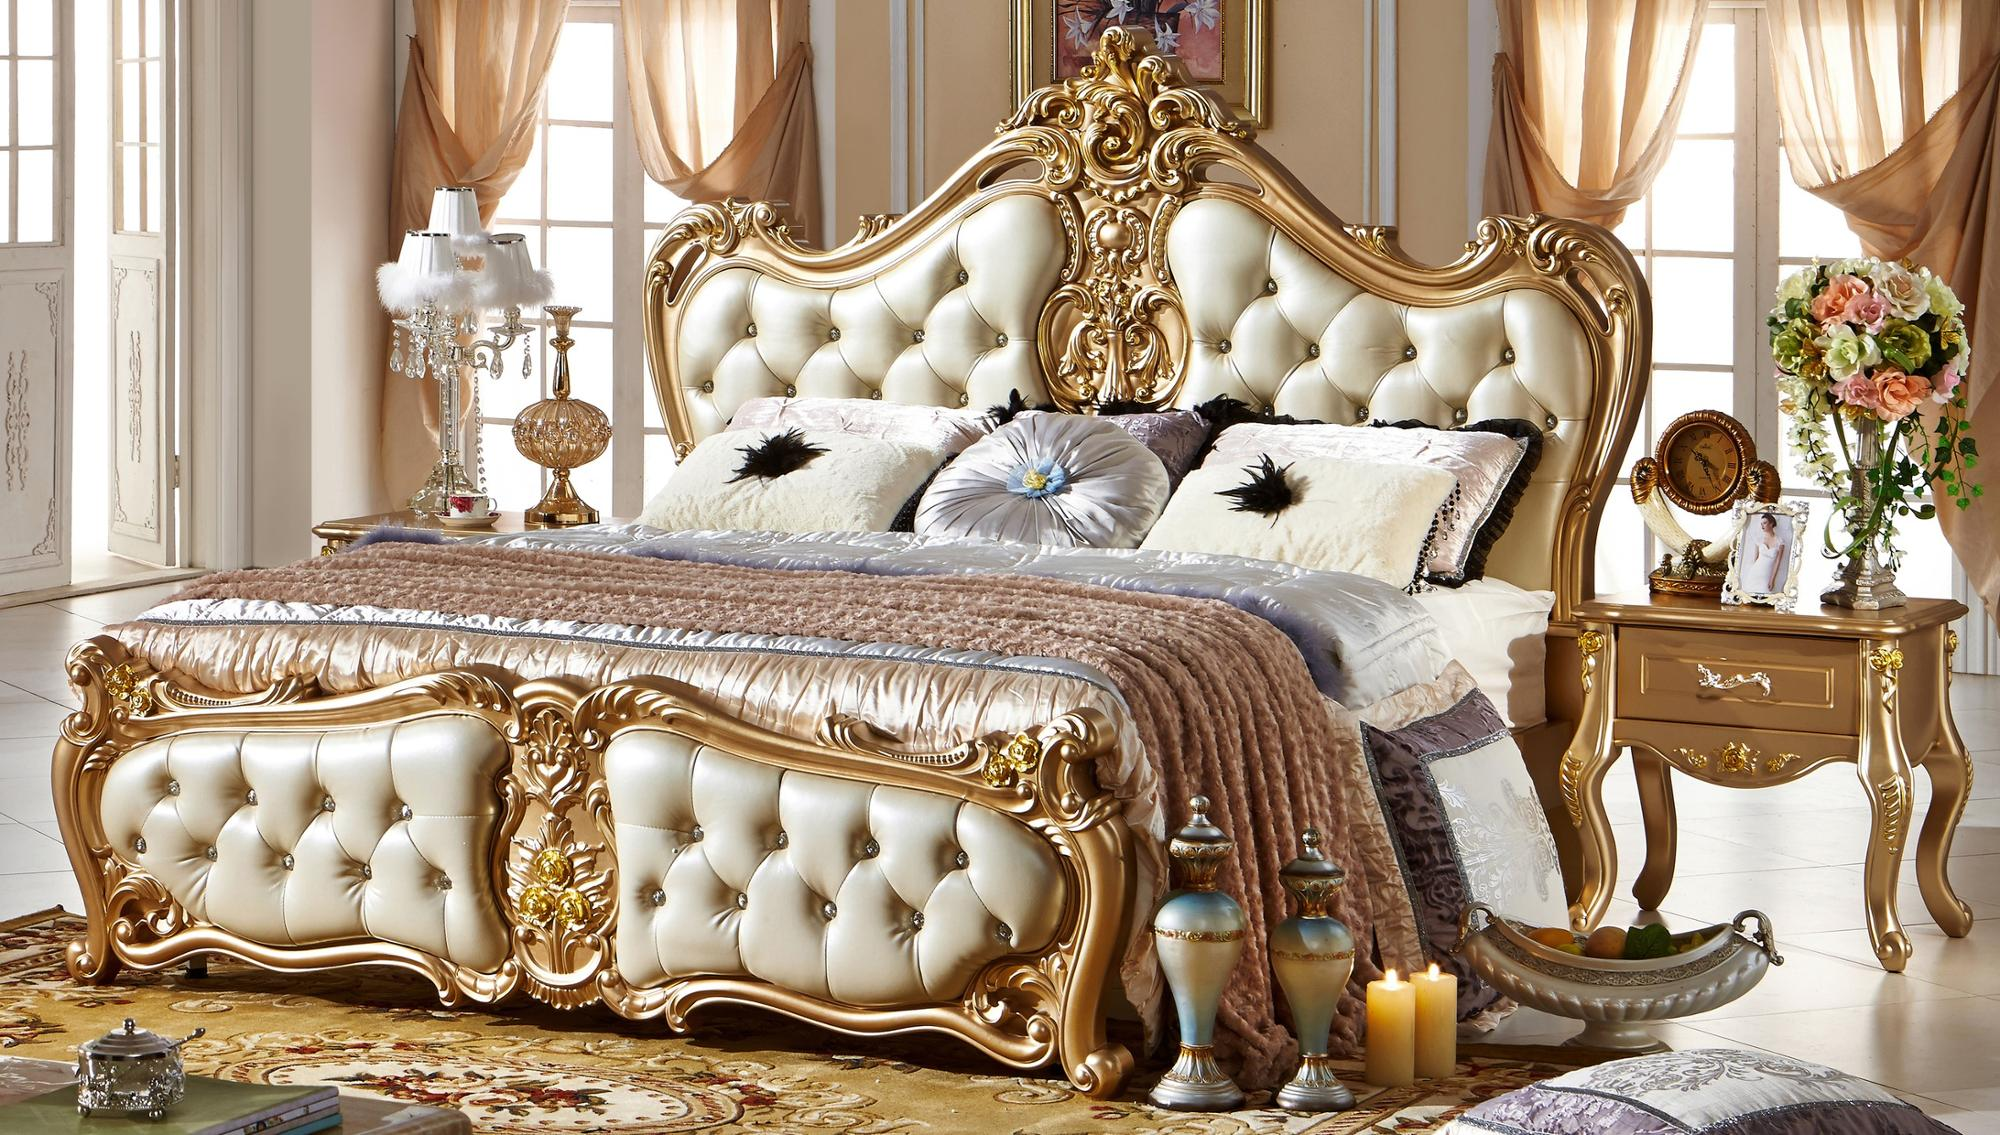 US $14.14 American modern style royal furniture antique 14 star hotel  bedroom setsdesigner leather bedsleather beditalian leather bed -  AliExpress